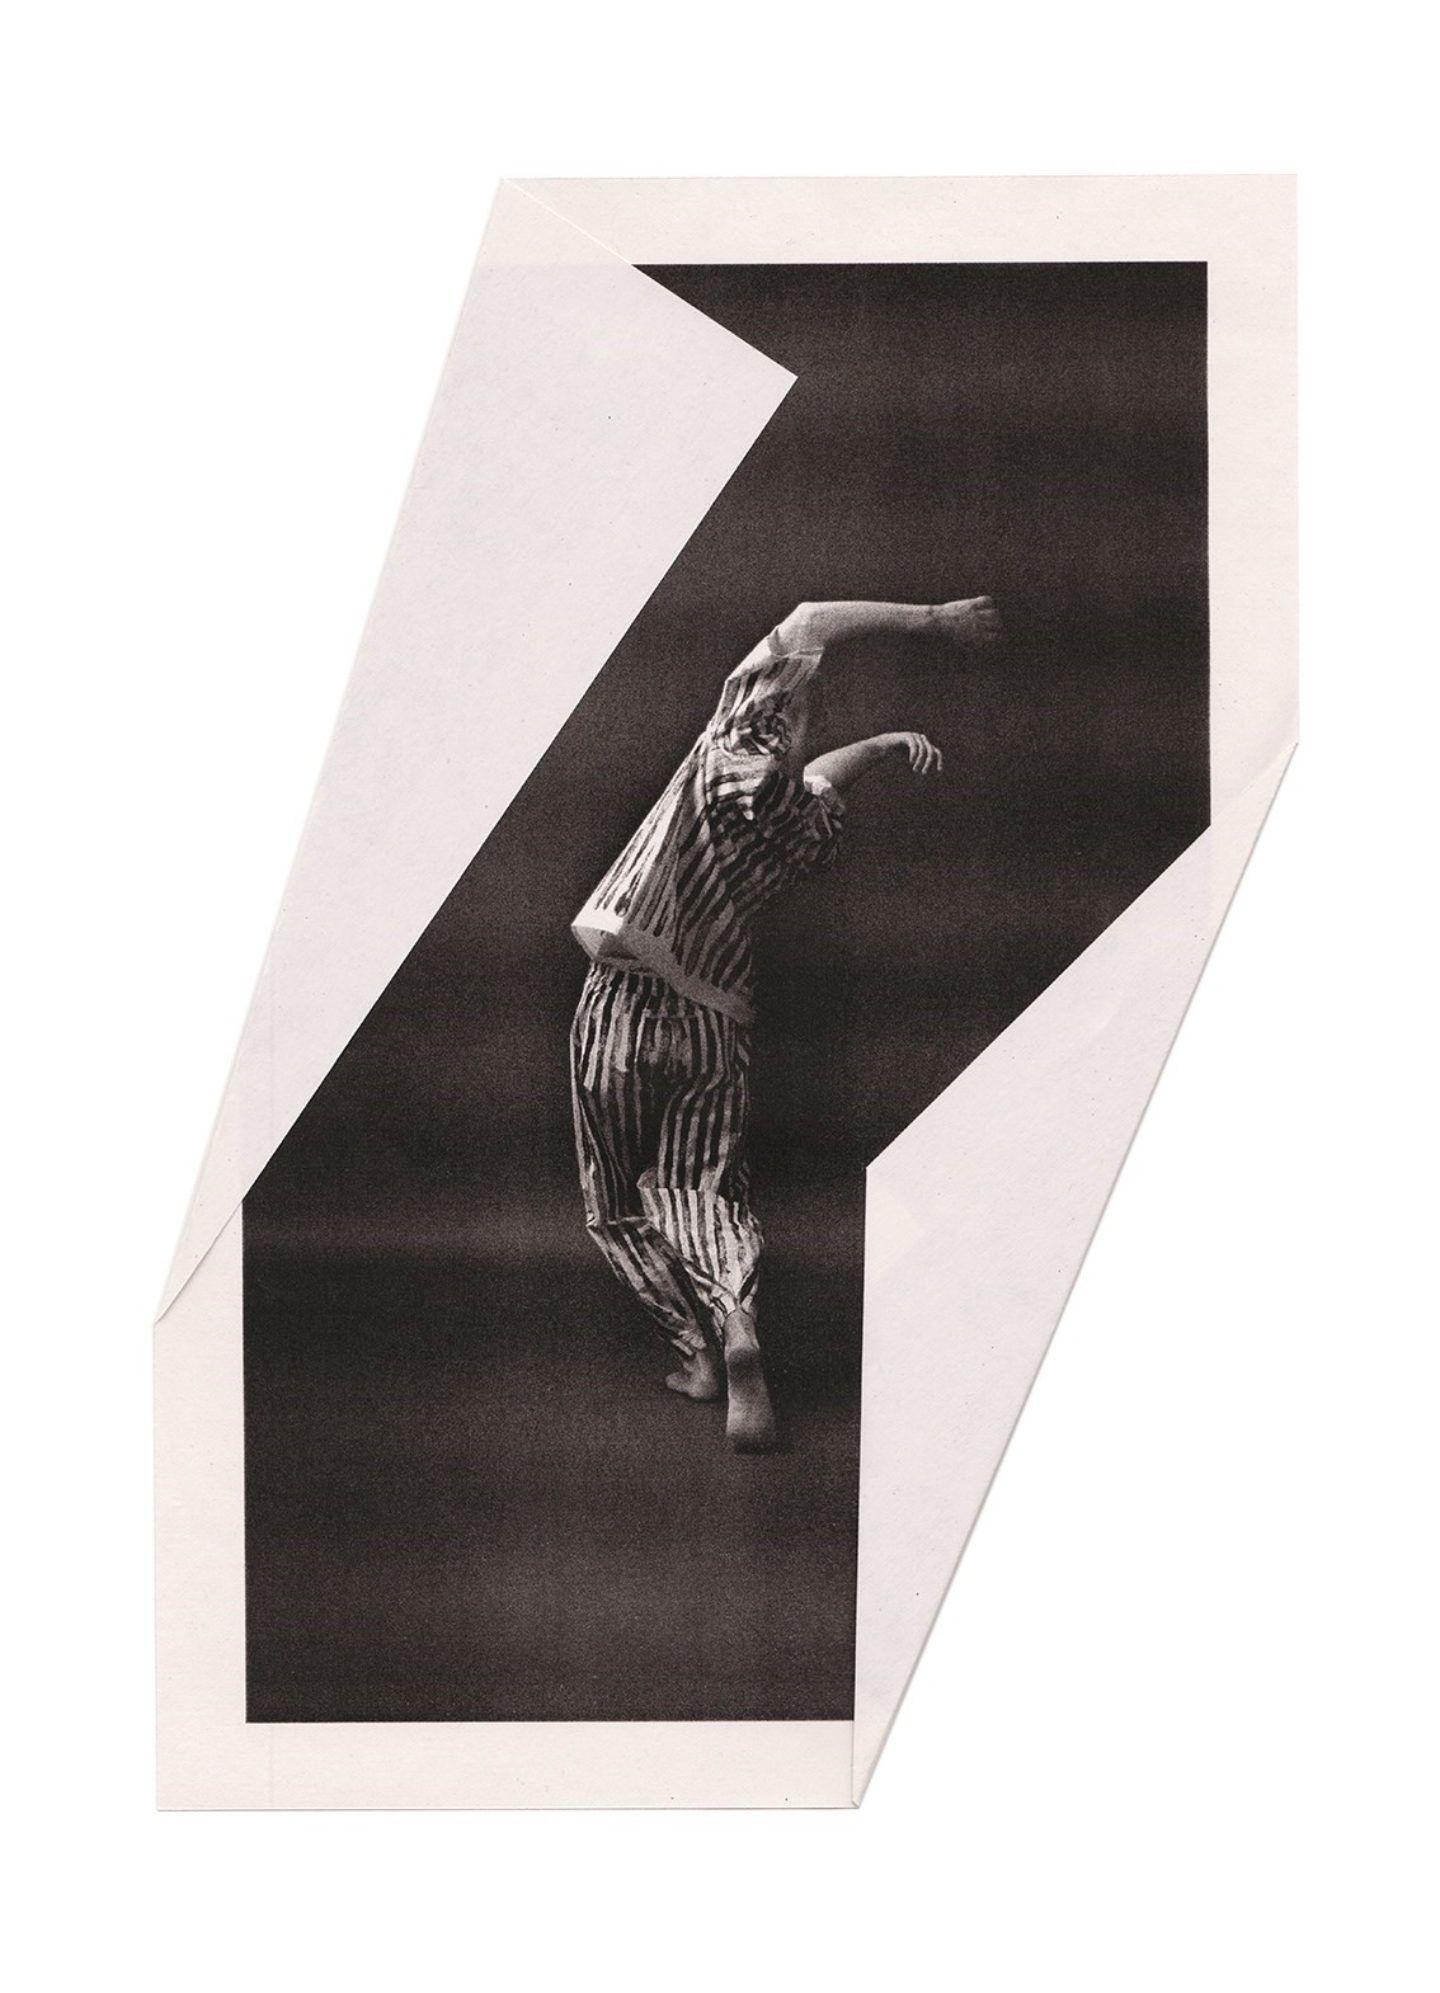 IGNANT-Art-Paul-Phung-Bruce-Usher-Dance-12